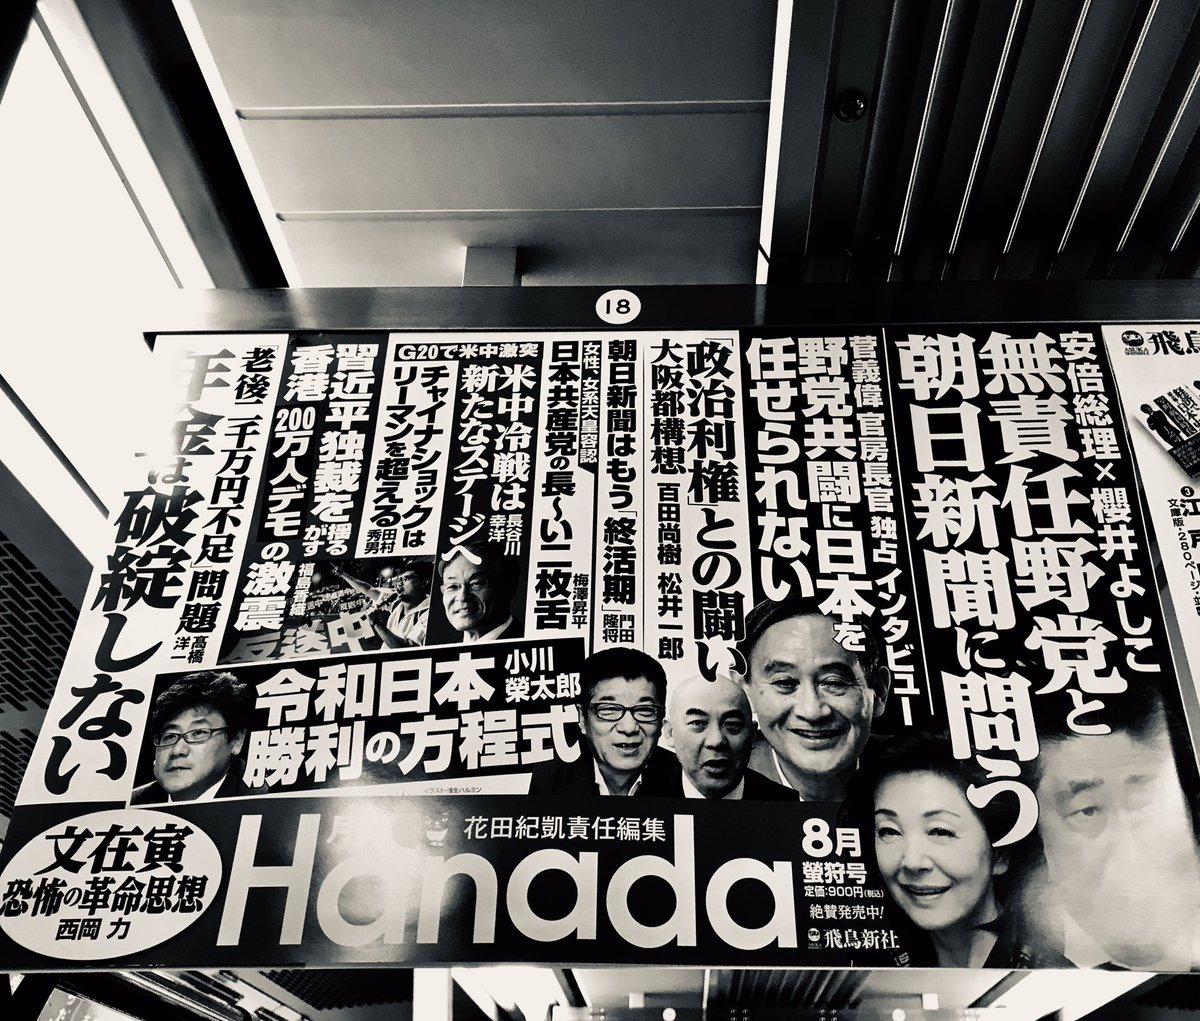 RT @JoshuaM2063: 地下鉄の中吊り広告が地獄絵図😱  安倍界隈が選挙期間中に広告費使いたい放題。まさか内閣官房費が流れてるんじゃあないですよね? https://t.co/ocQwPhHU1C